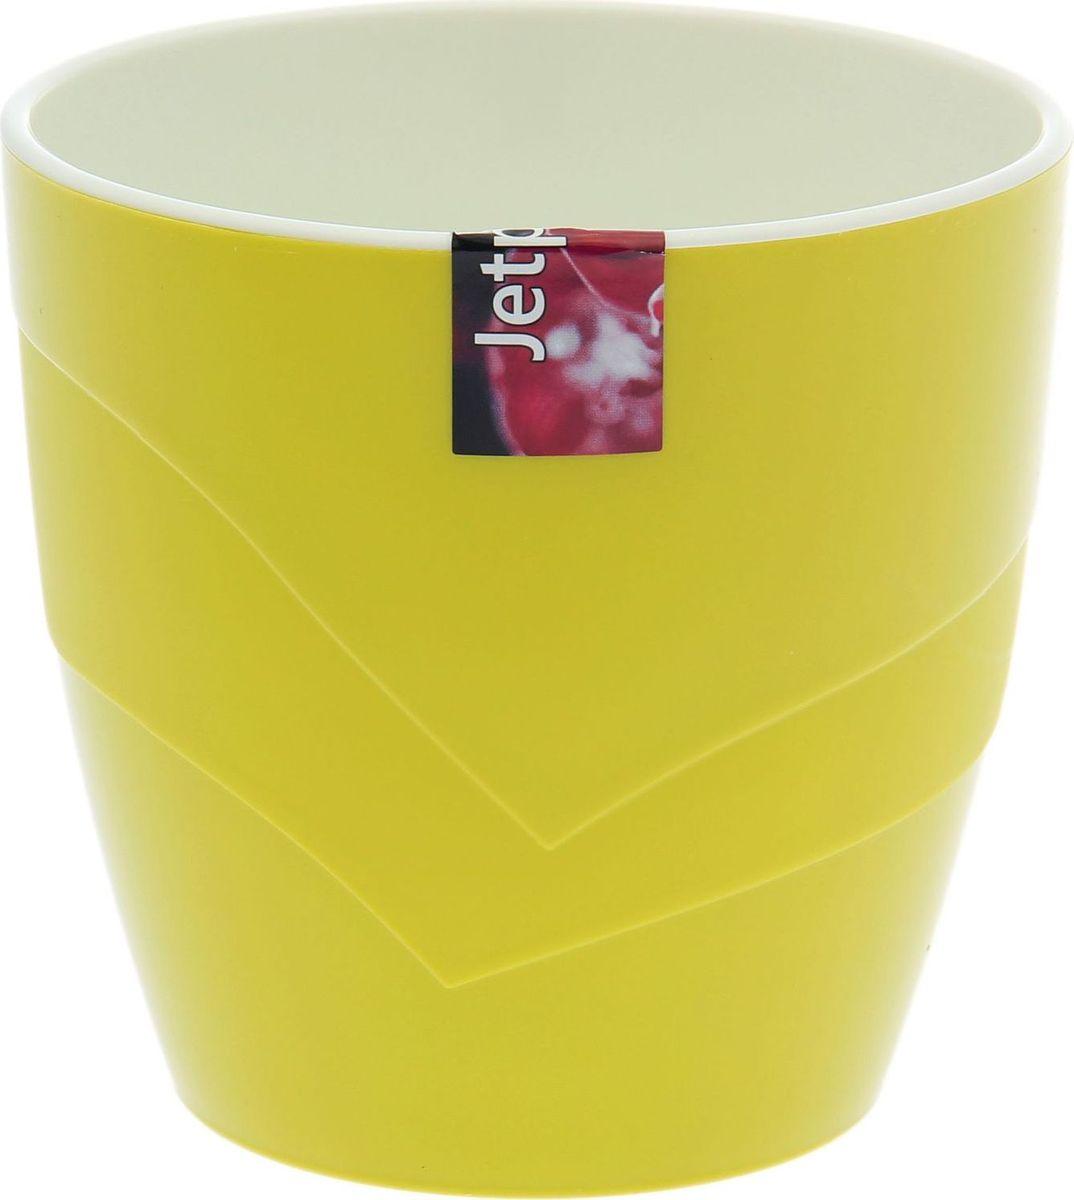 Кашпо JetPlast Грация, цвет: фисташковый, 1,2 л1694308